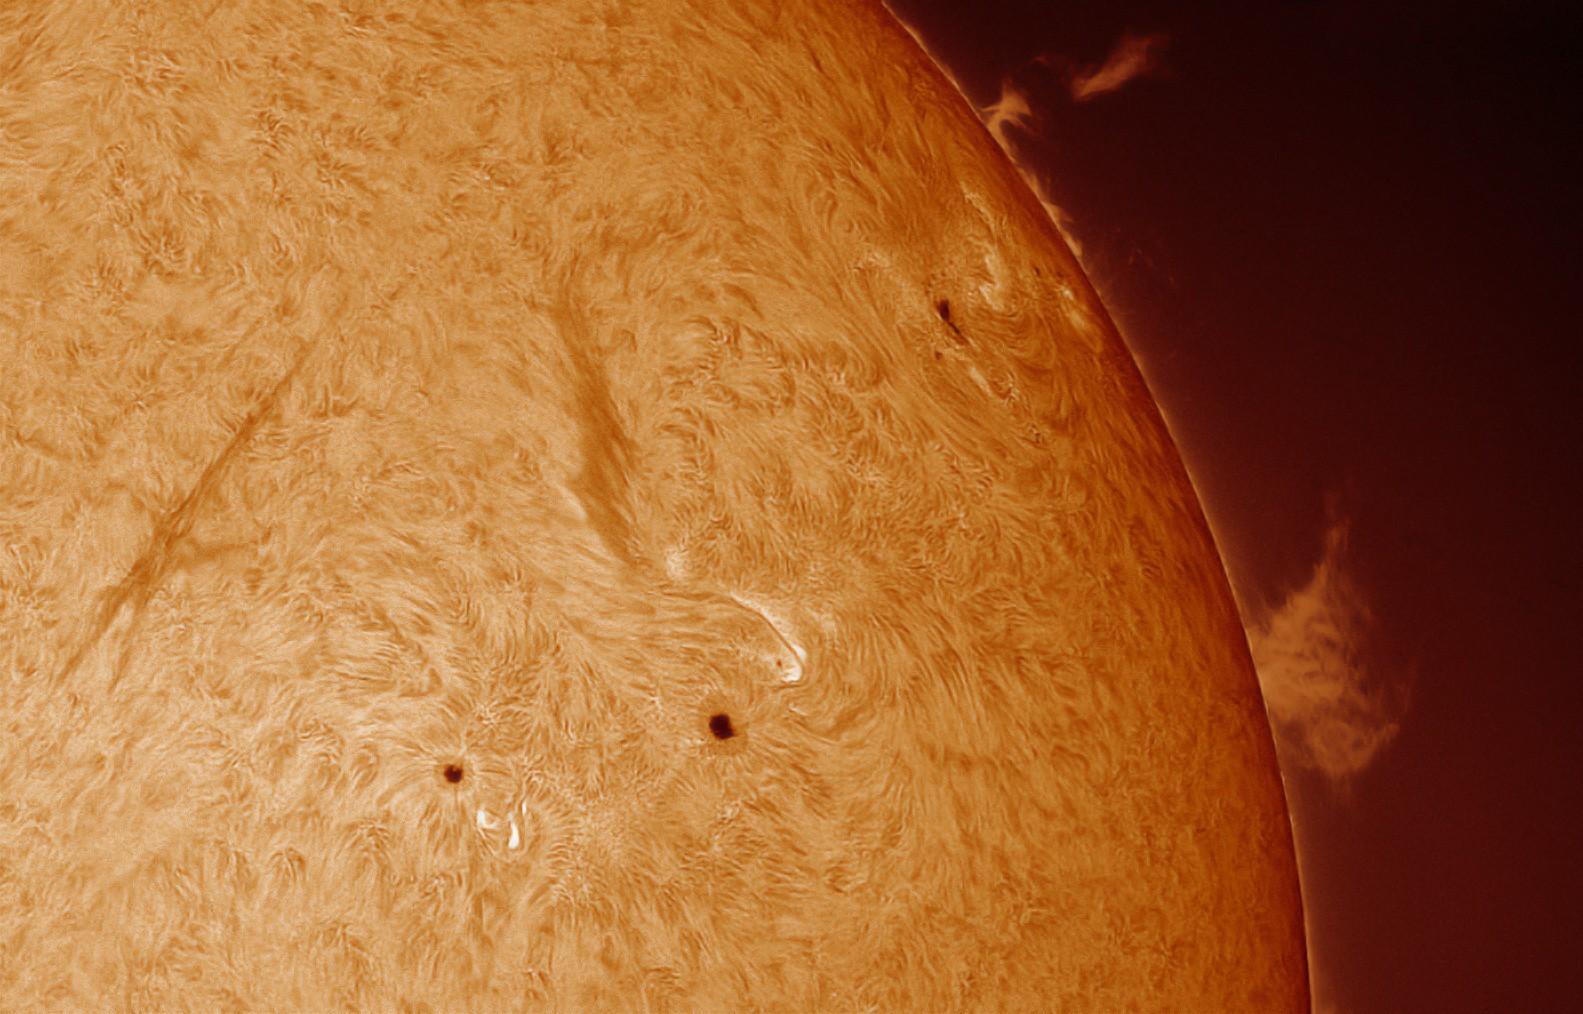 Application image: © K. v. Schauroth – for more images please visit our image gallery on www.astrosolar.com